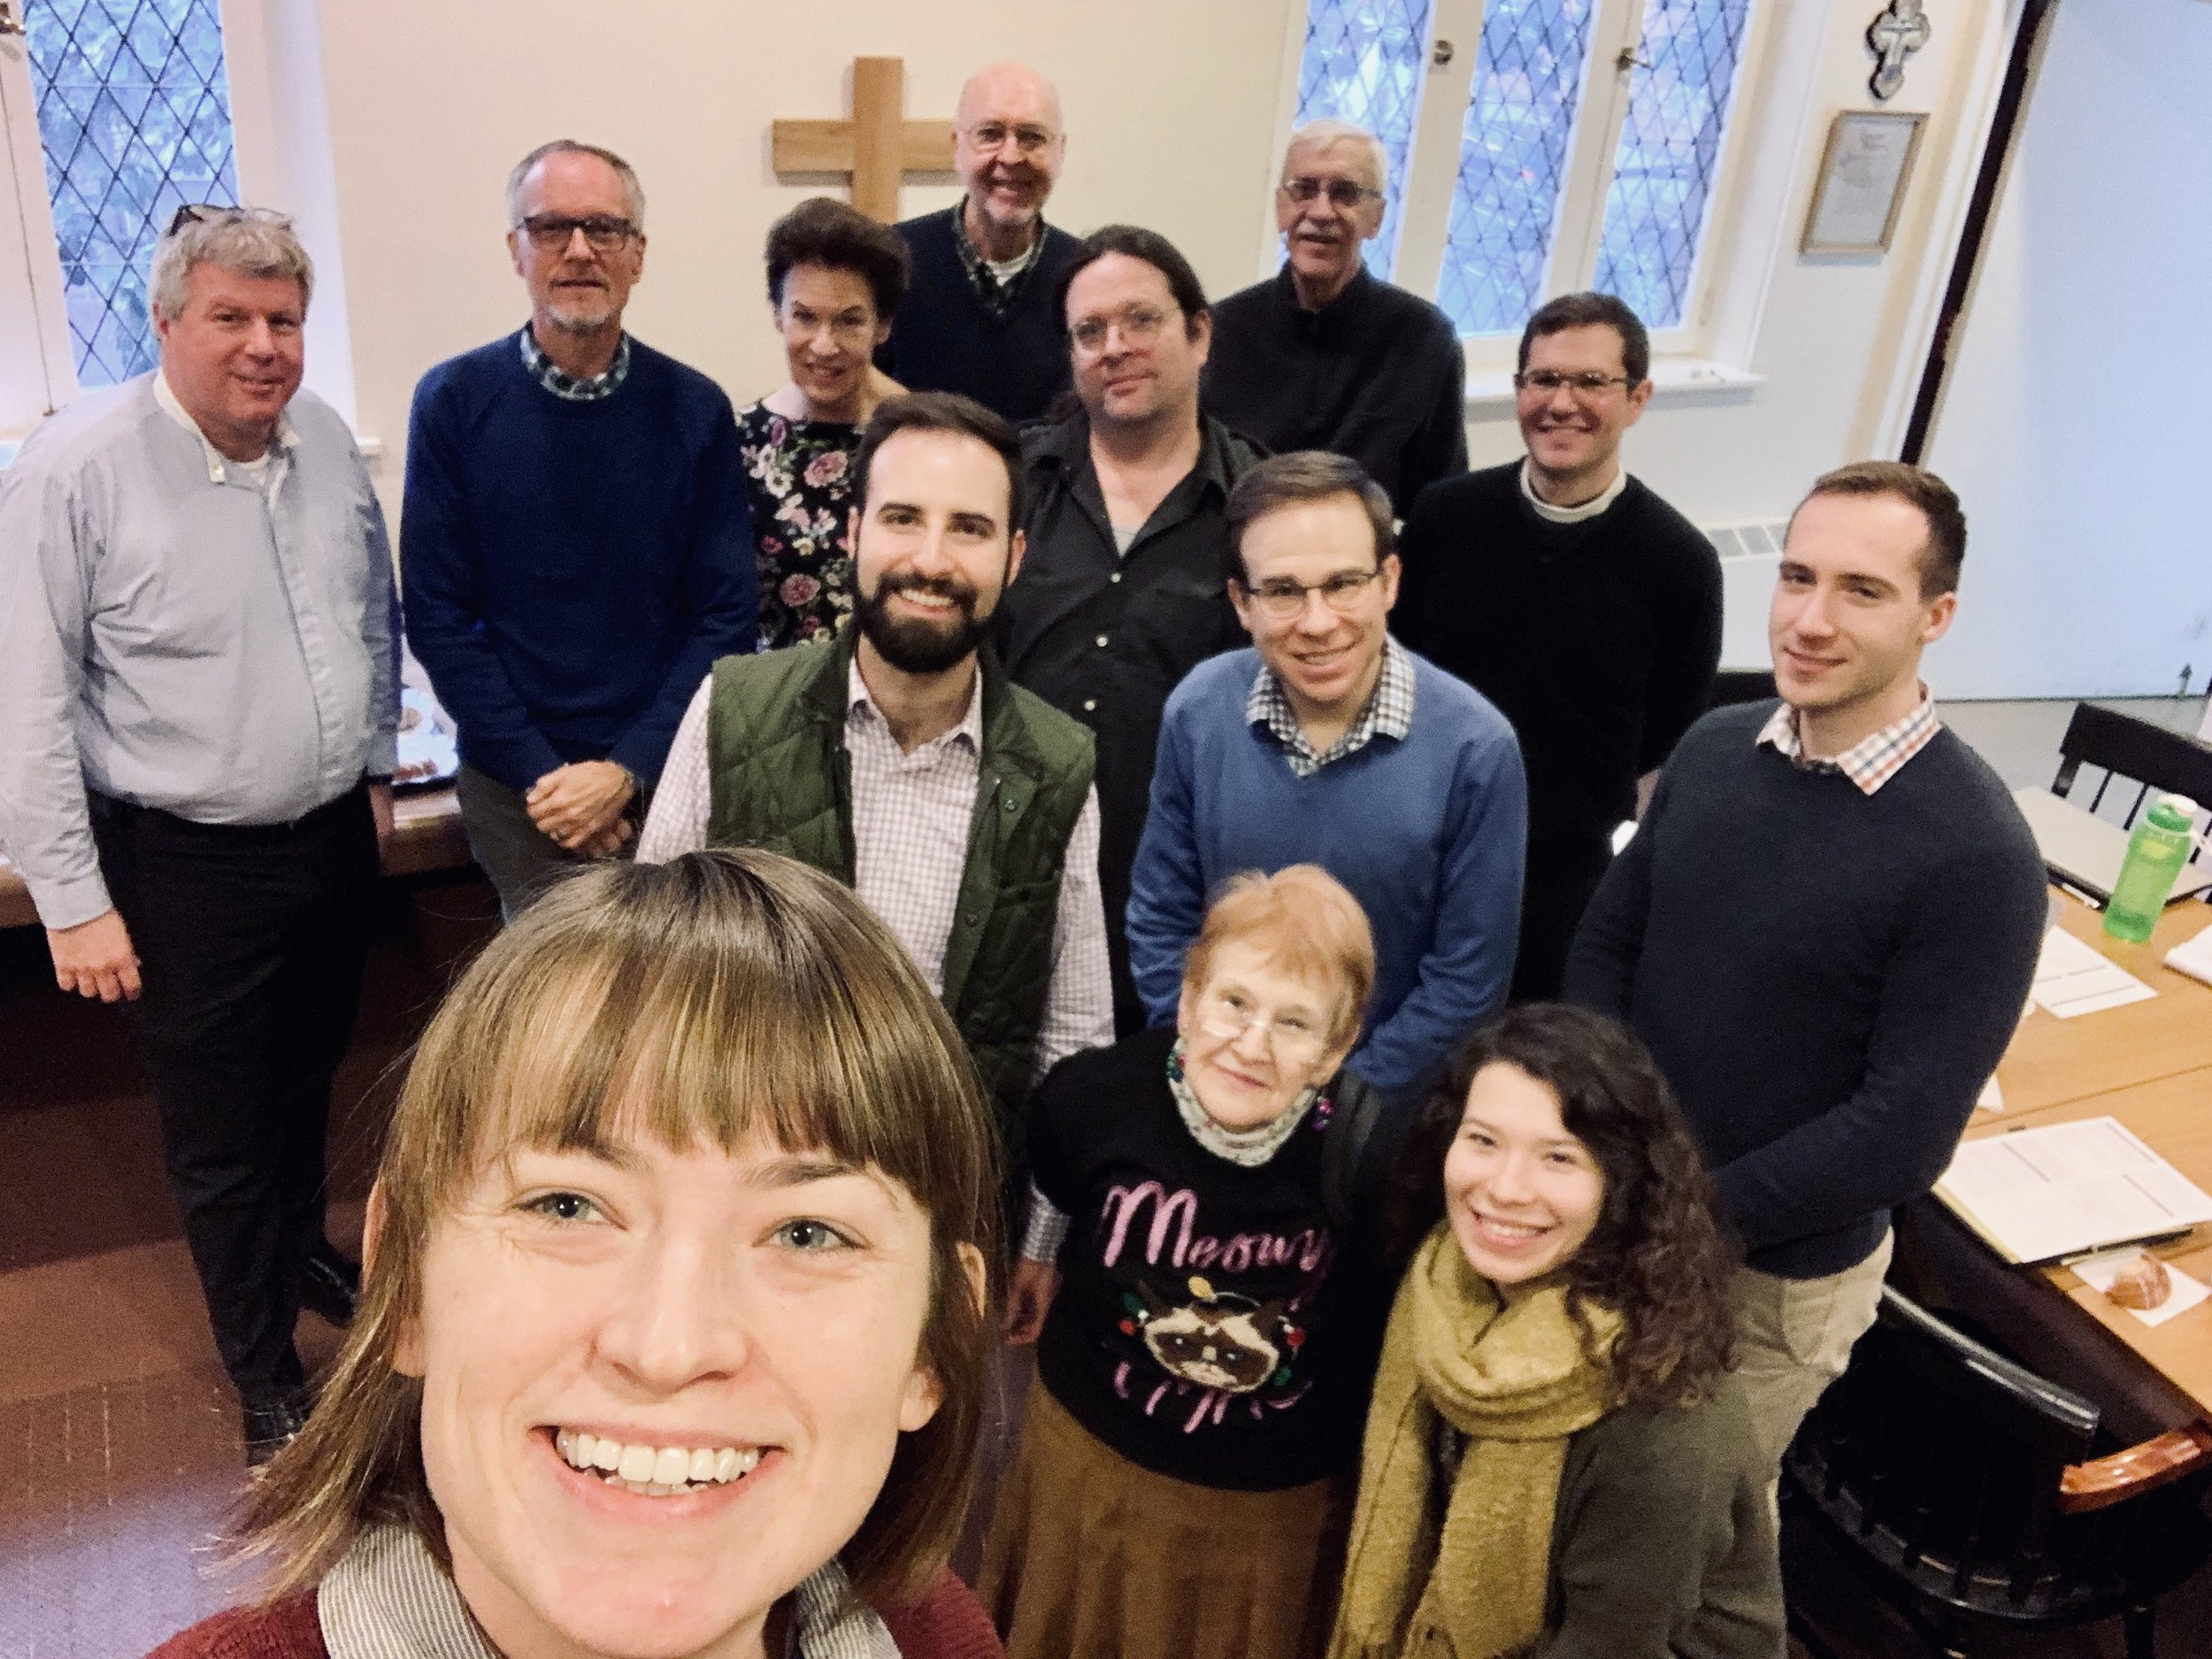 Selfie of the Saint Mark's Staff and Office Volunteers